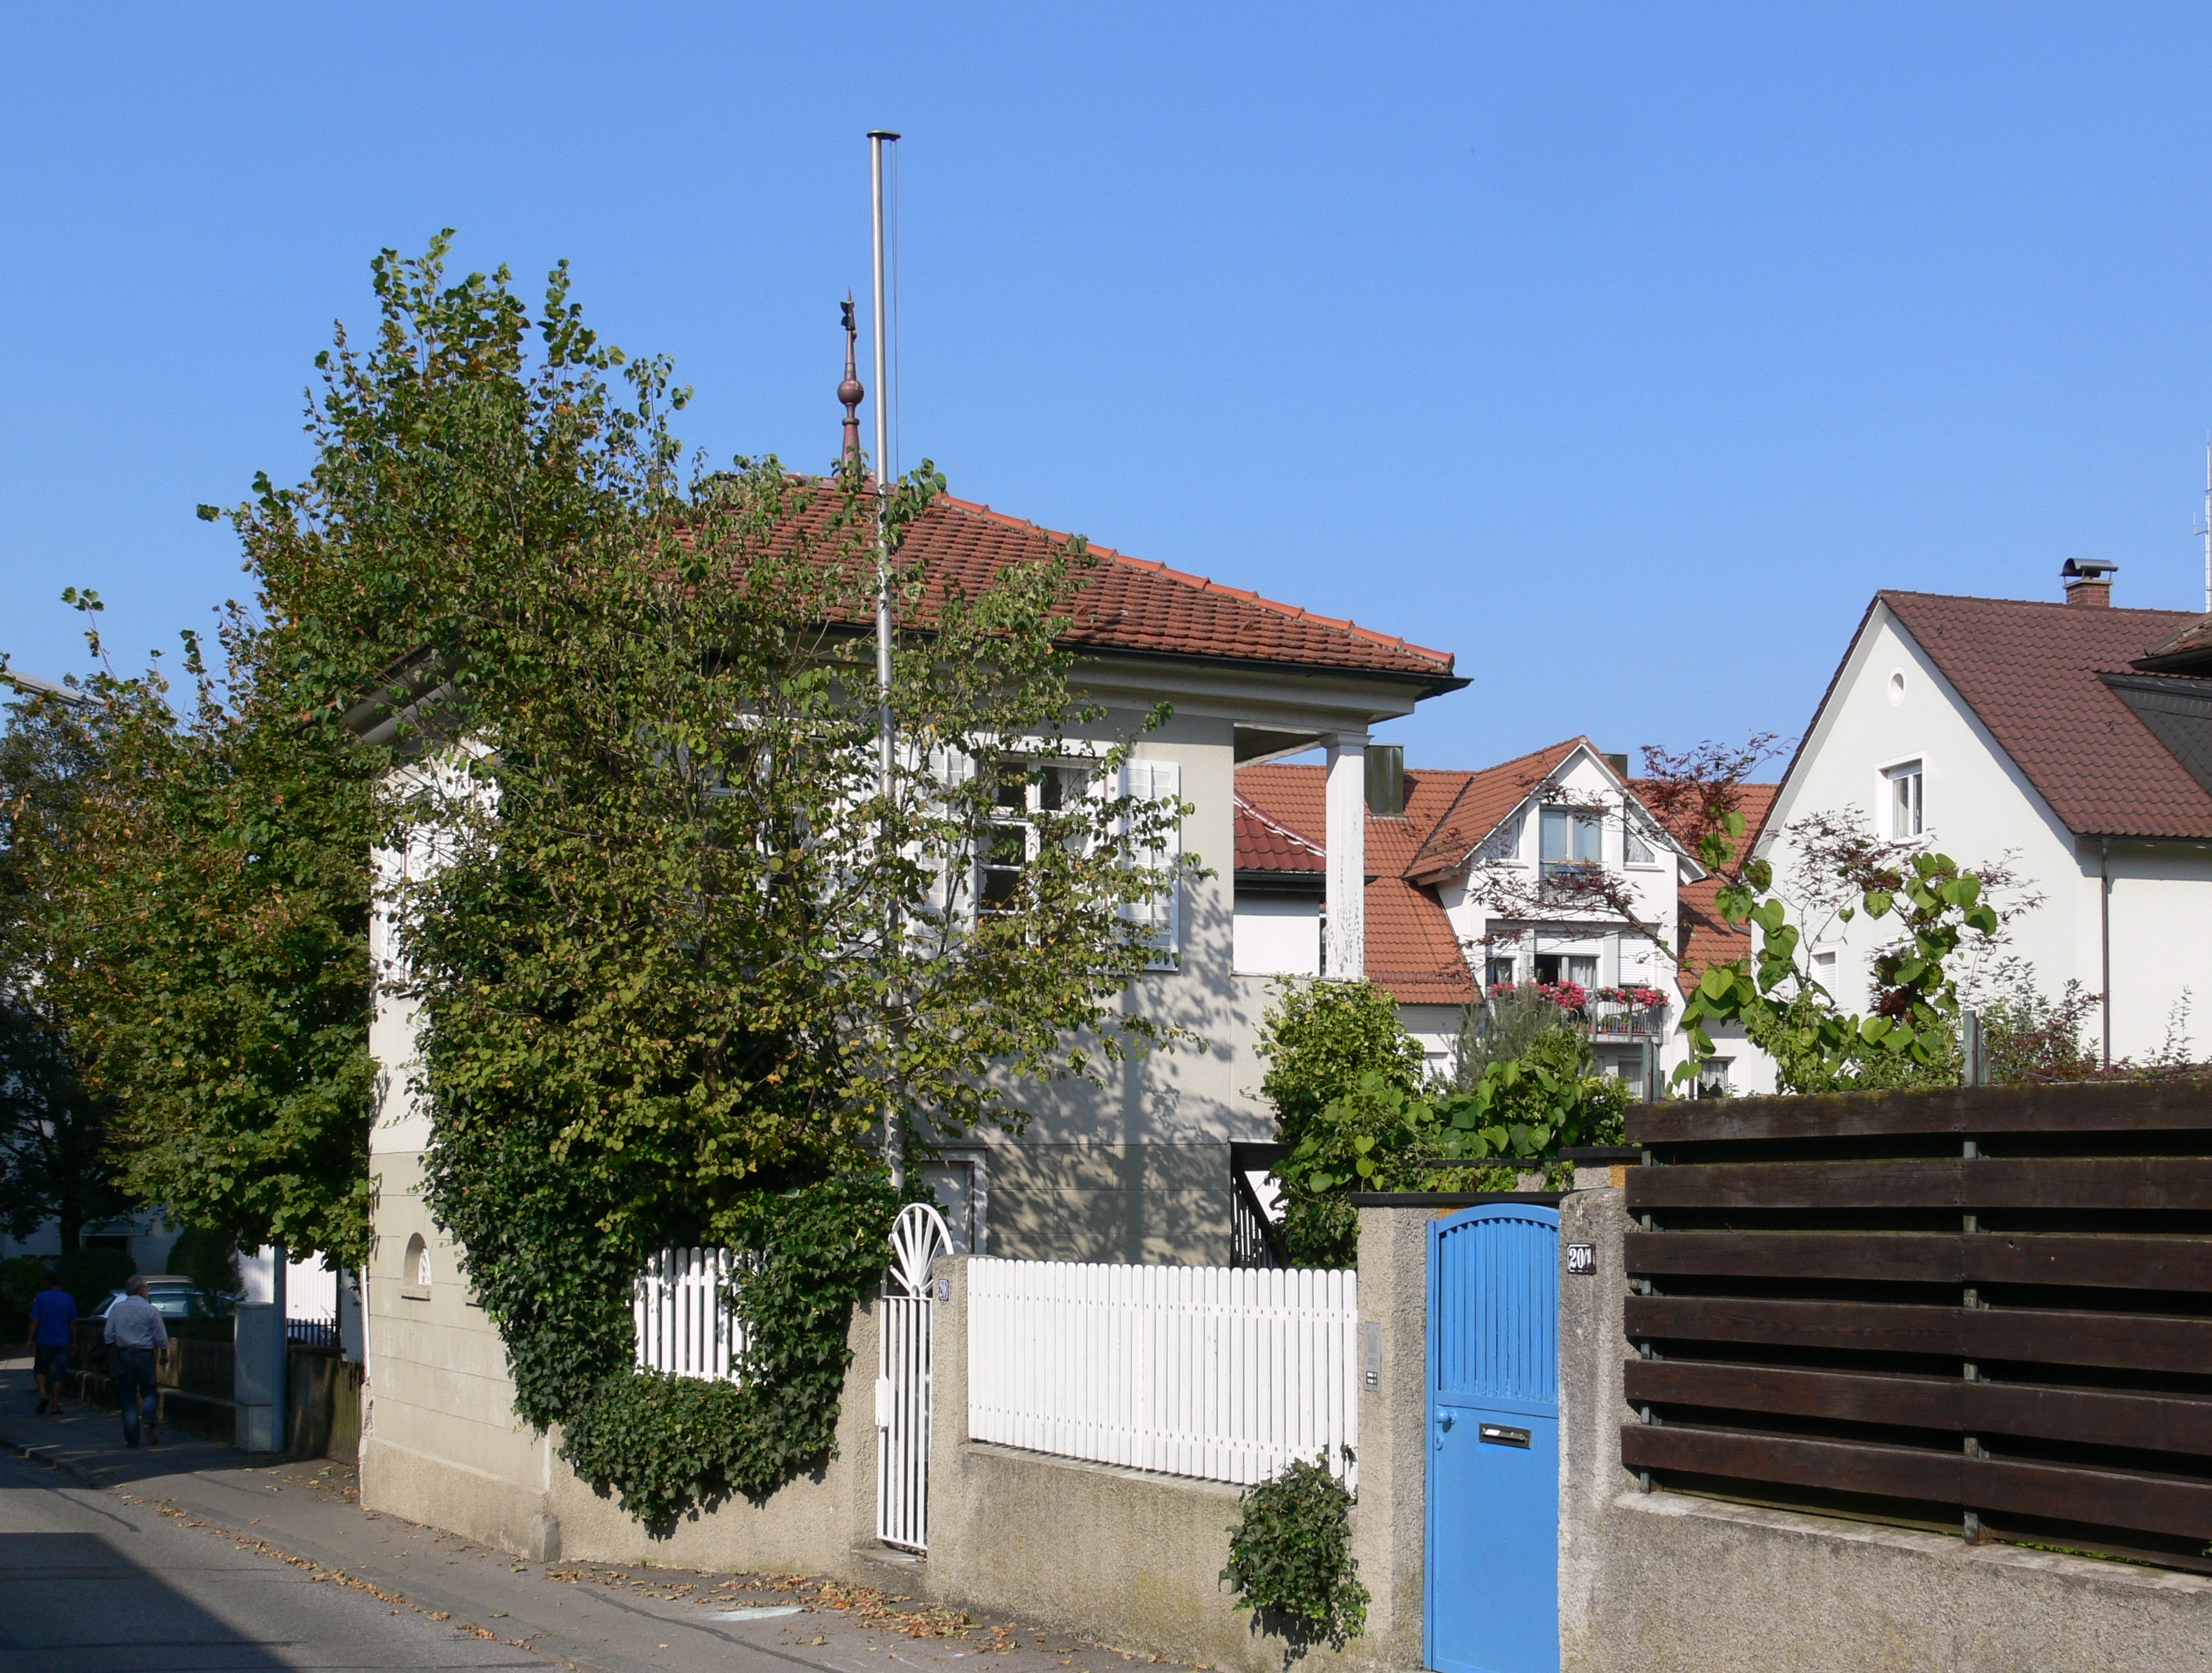 Datei Ravensburg Kuppelnaustrasse Gartenhaus 2 Jpg Wikipedia